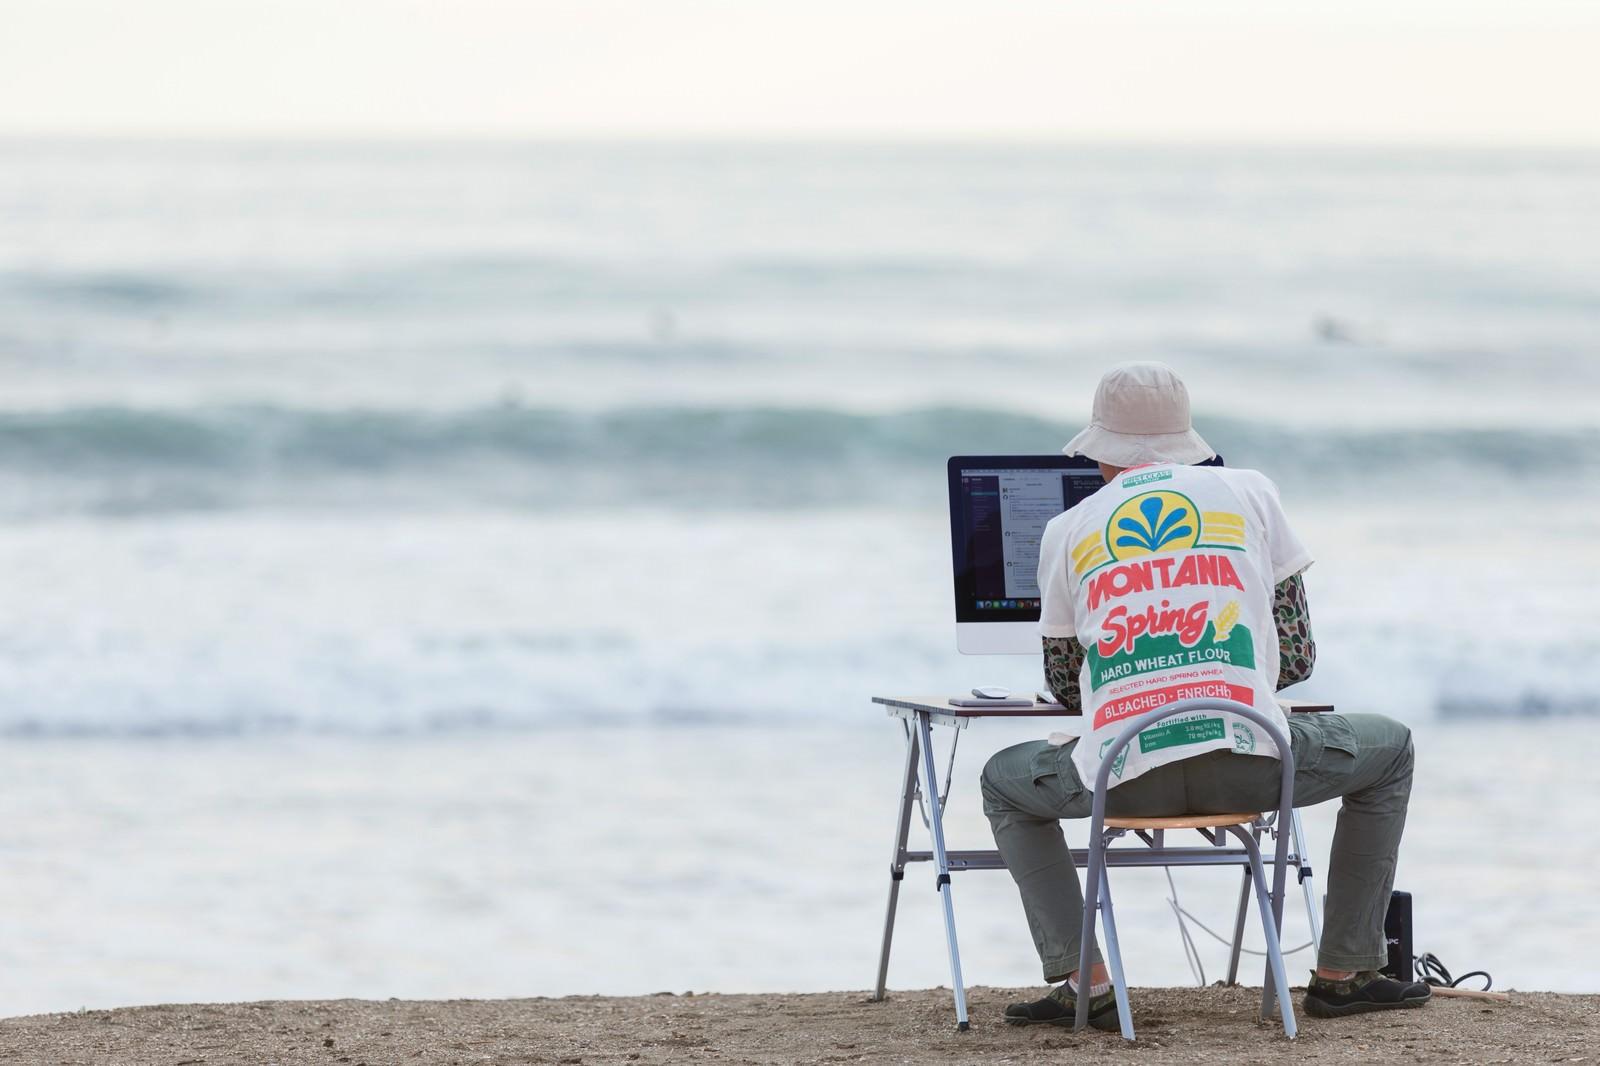 「GW明け、締め切りの波が続々と目の前に押し寄せるWebデザイナー | 写真の無料素材・フリー素材 - ぱくたそ」の写真